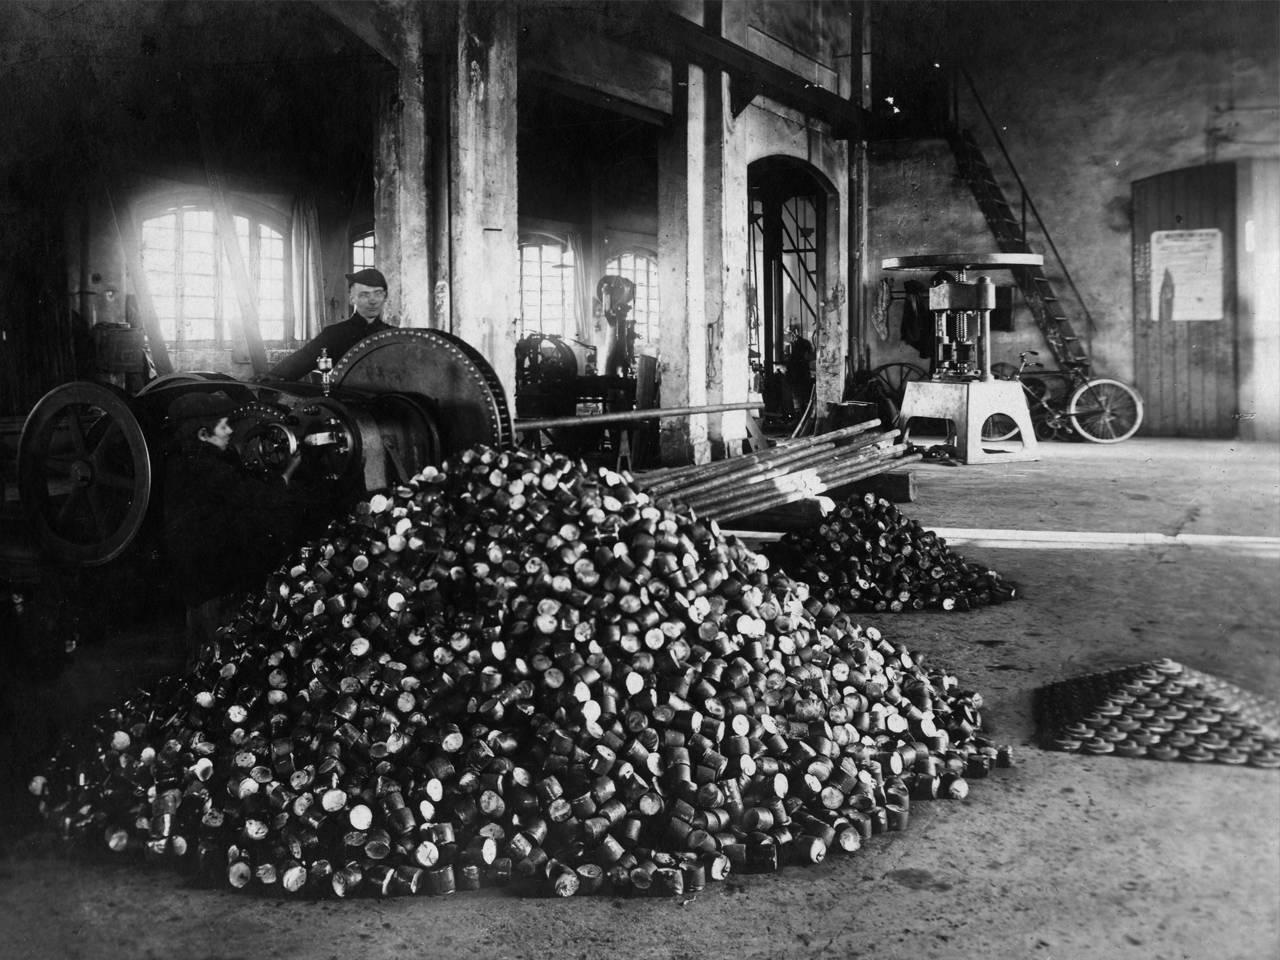 forniture di guerra: fabbricazione proiettili, officine meccaniche e officine gardenia